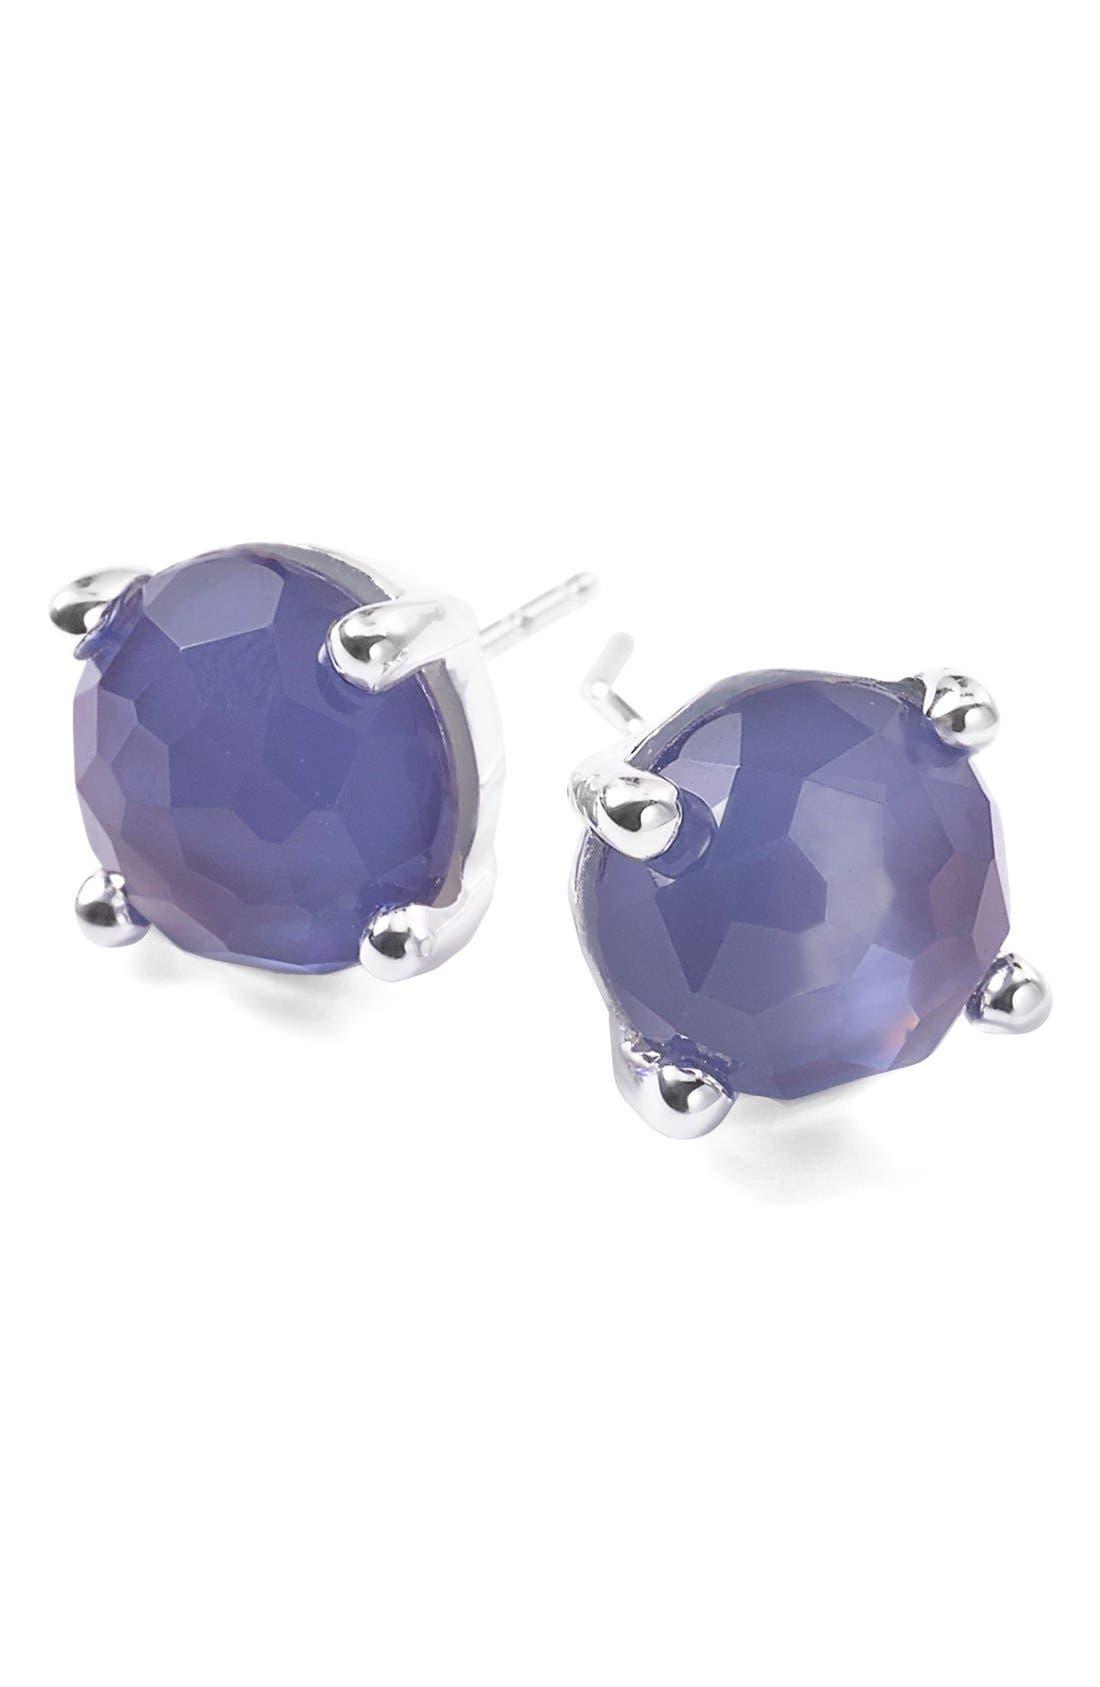 Alternate Image 1 Selected - Ippolita 'Rock Candy' Mini Stud Earrings